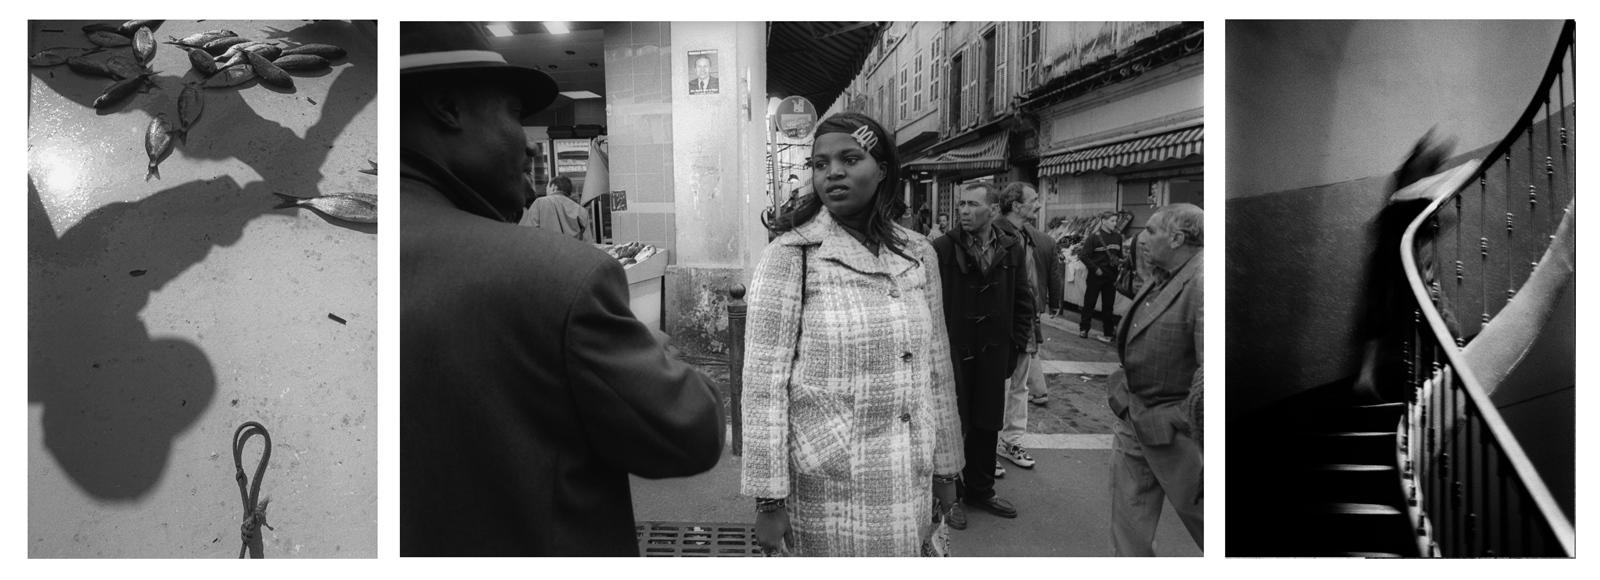 Art and Documentary Photography - Loading 033_a_Marseille___Fabio_Sgroi.jpg